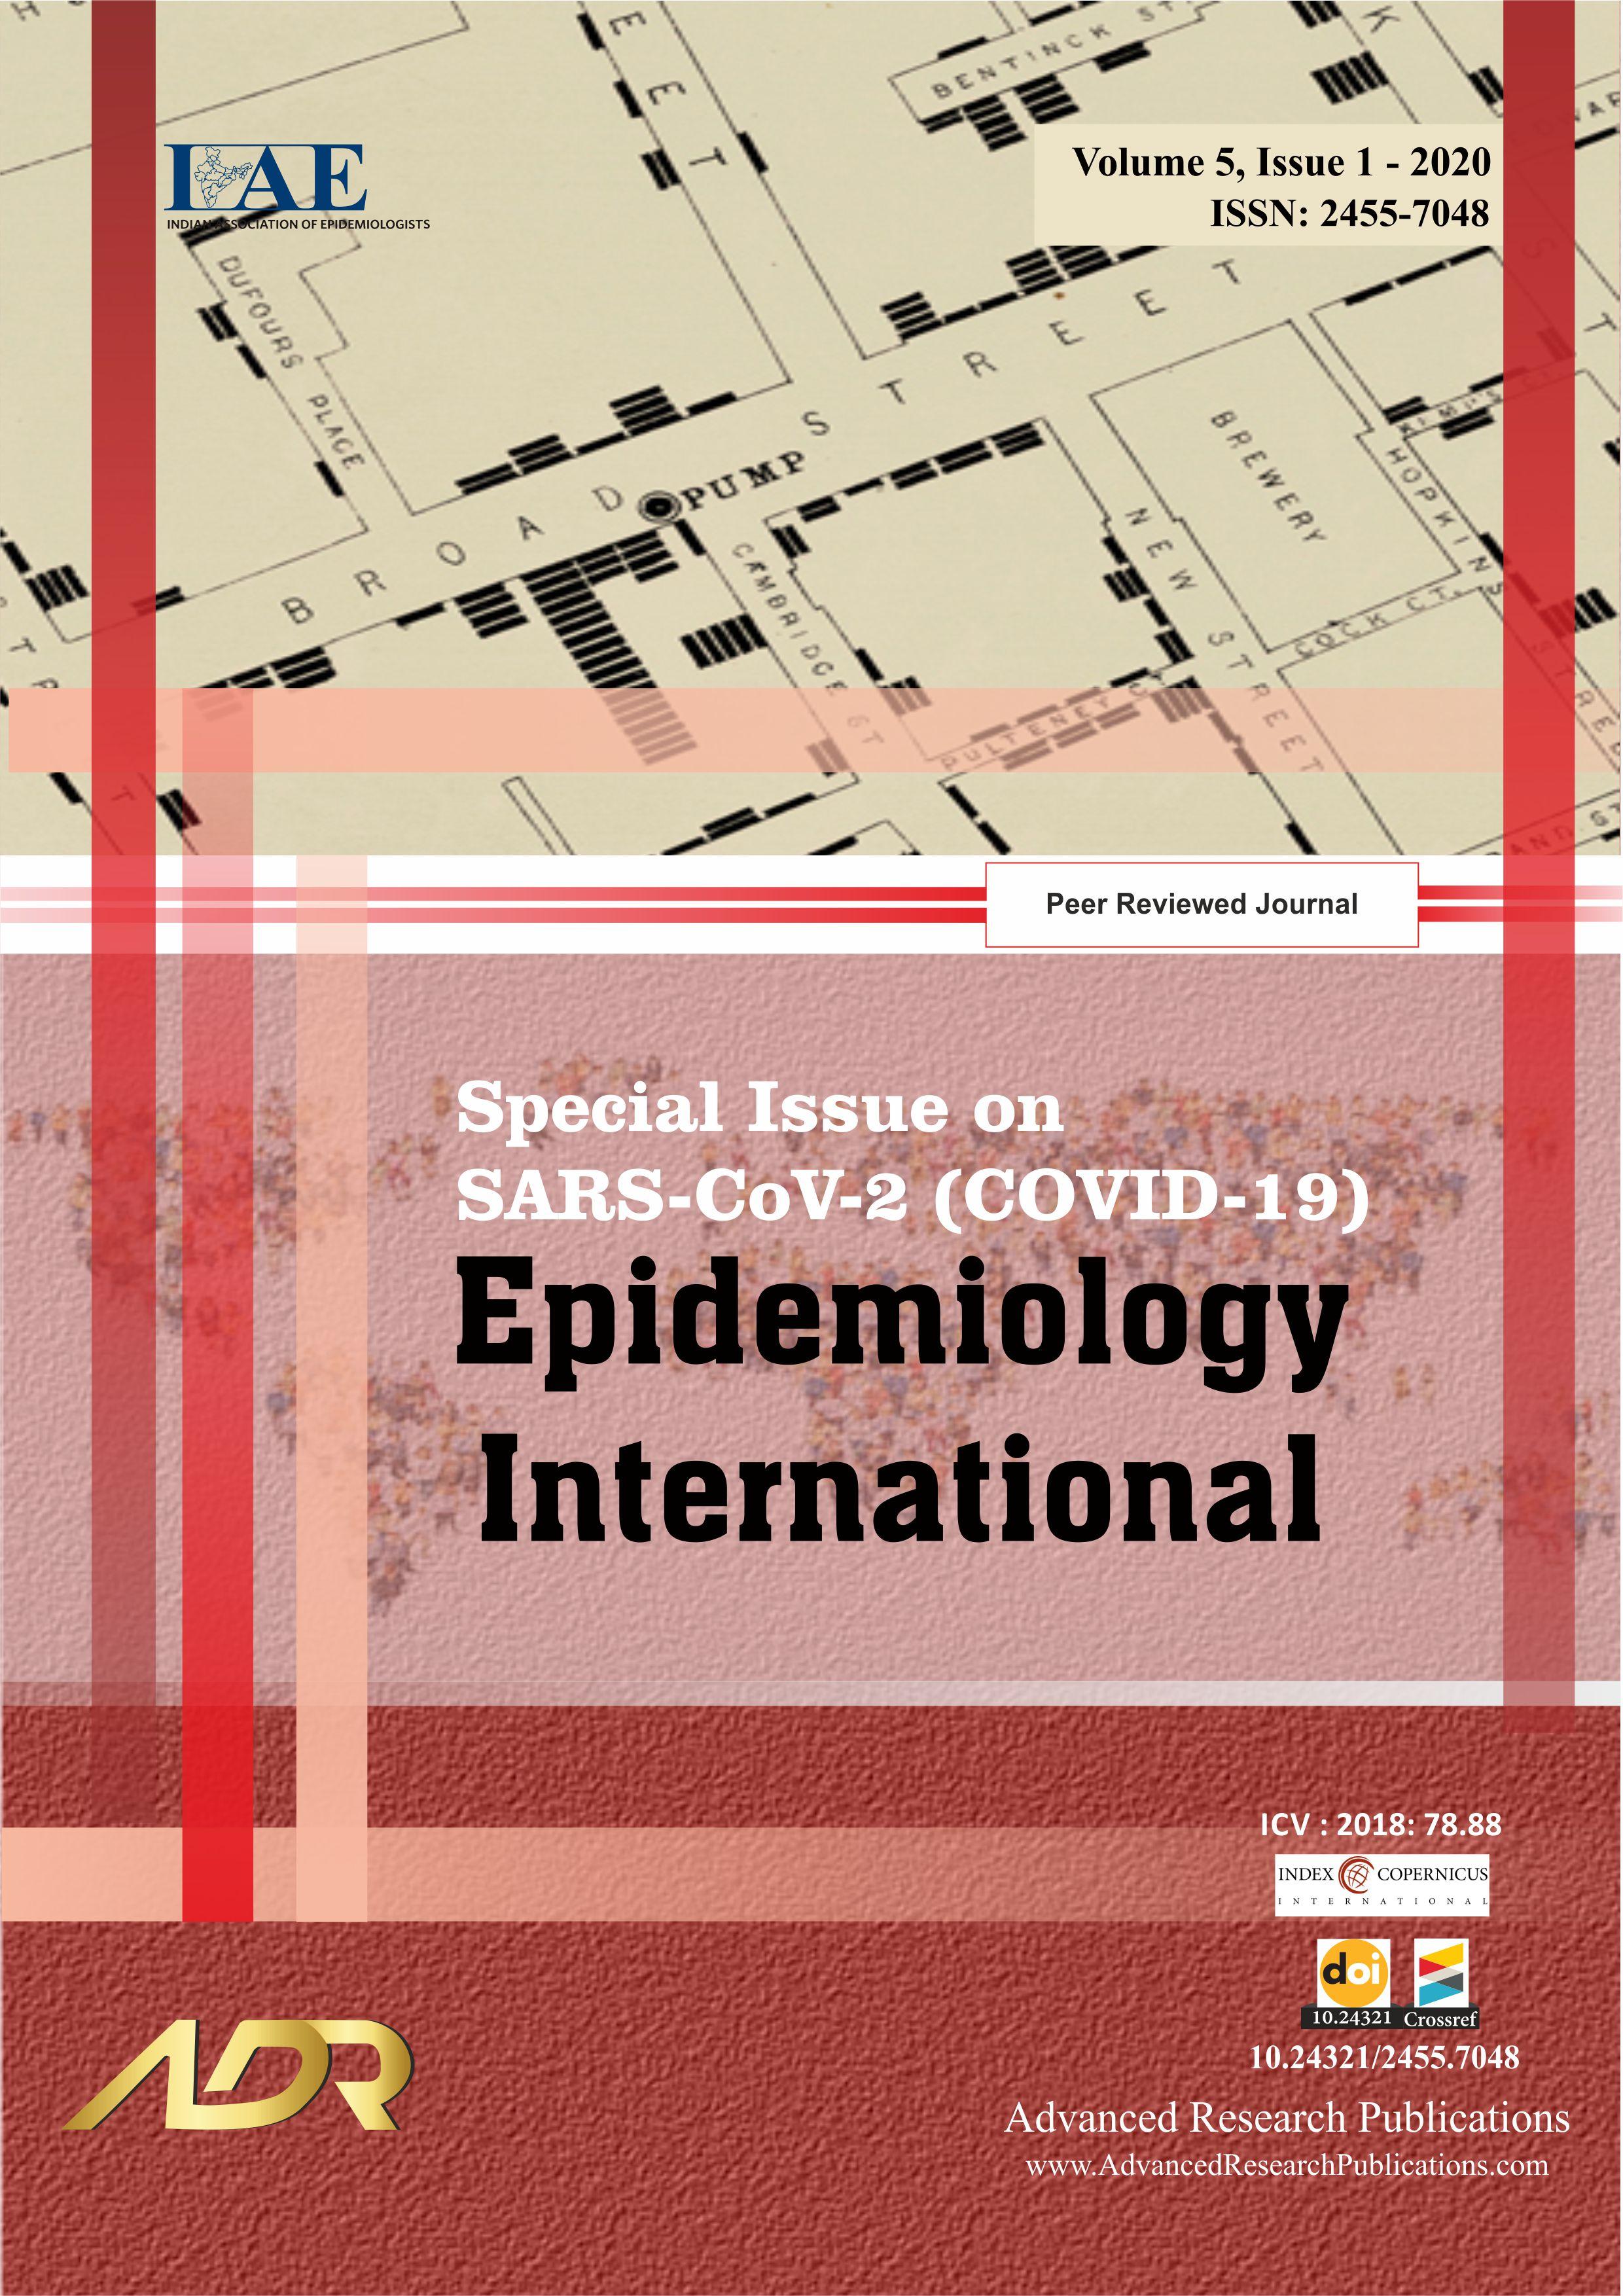 SARS-CoV-2 (COVID-19) - Epidemiology International